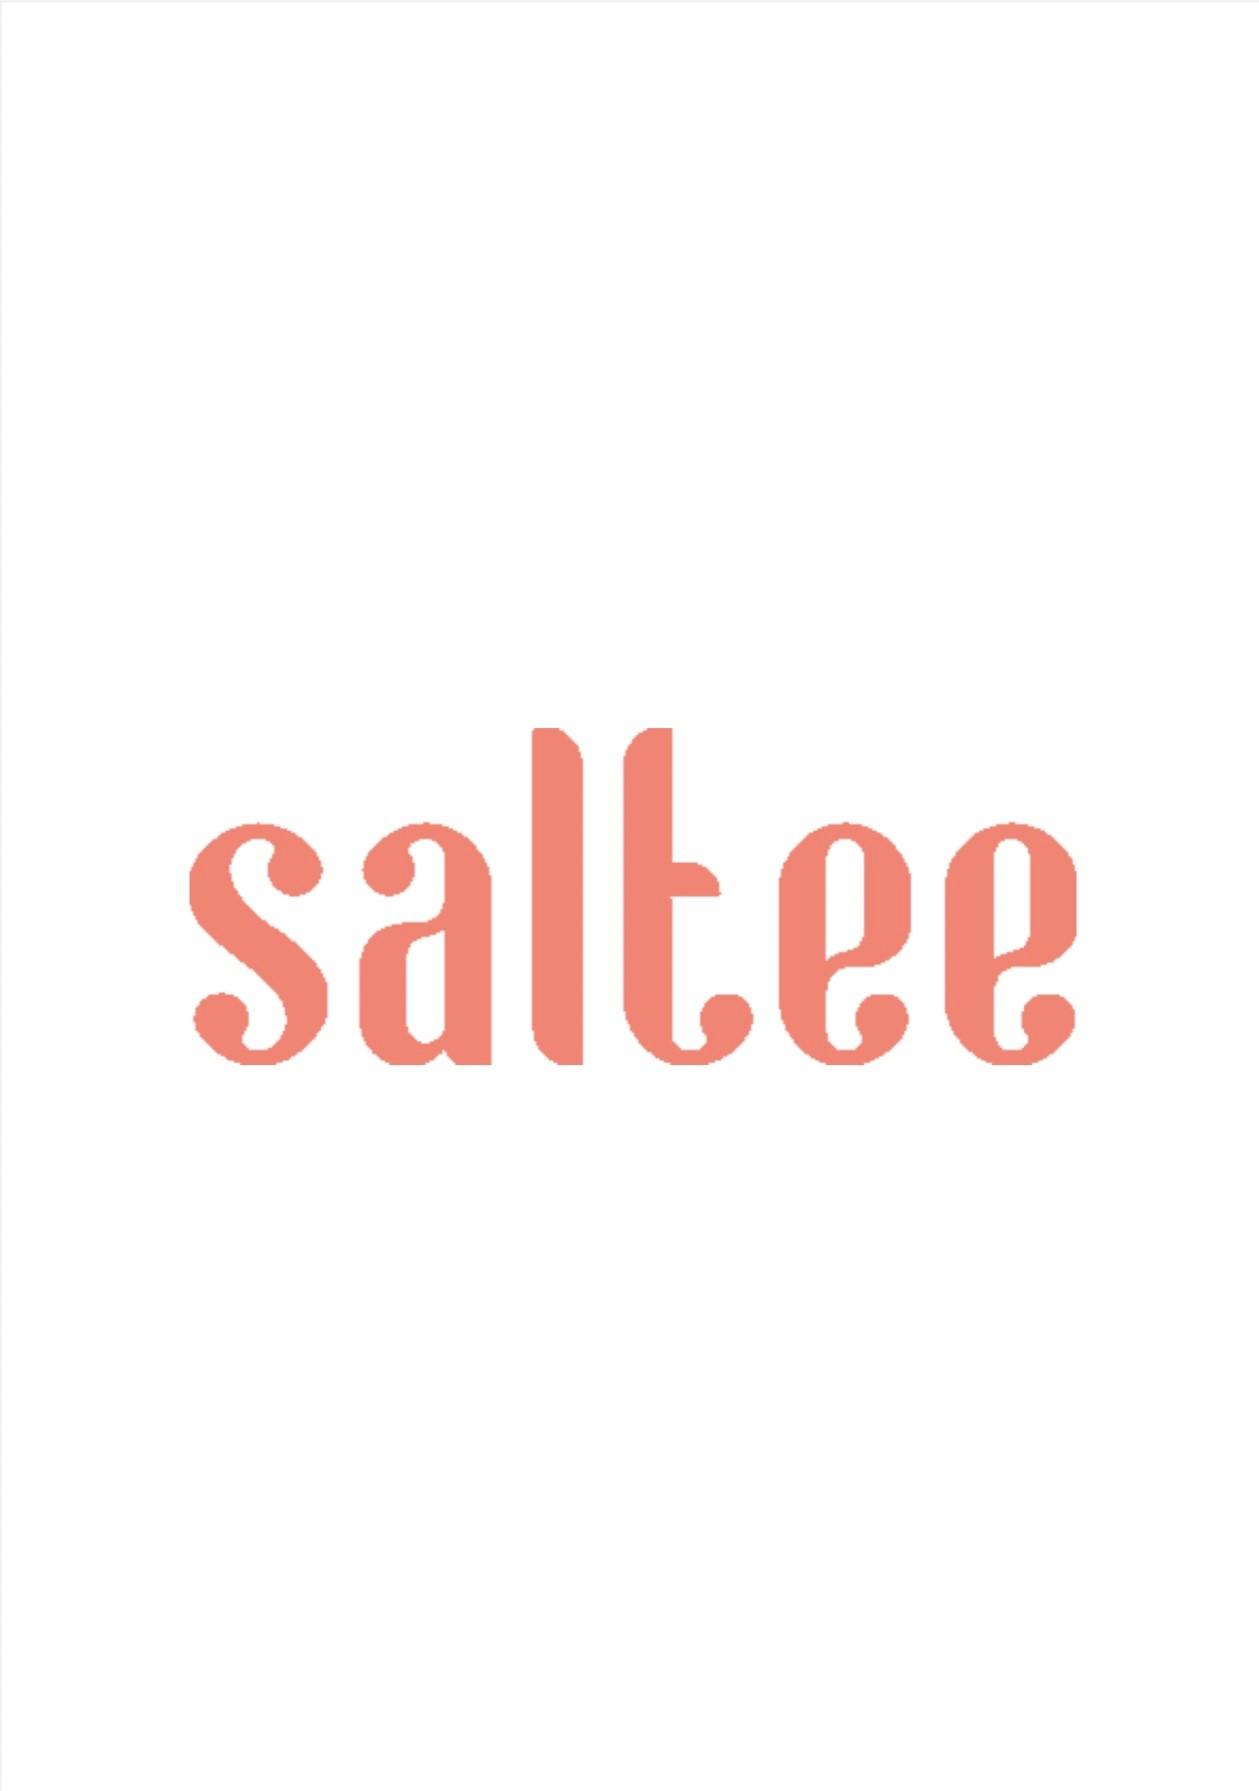 Saltee logo